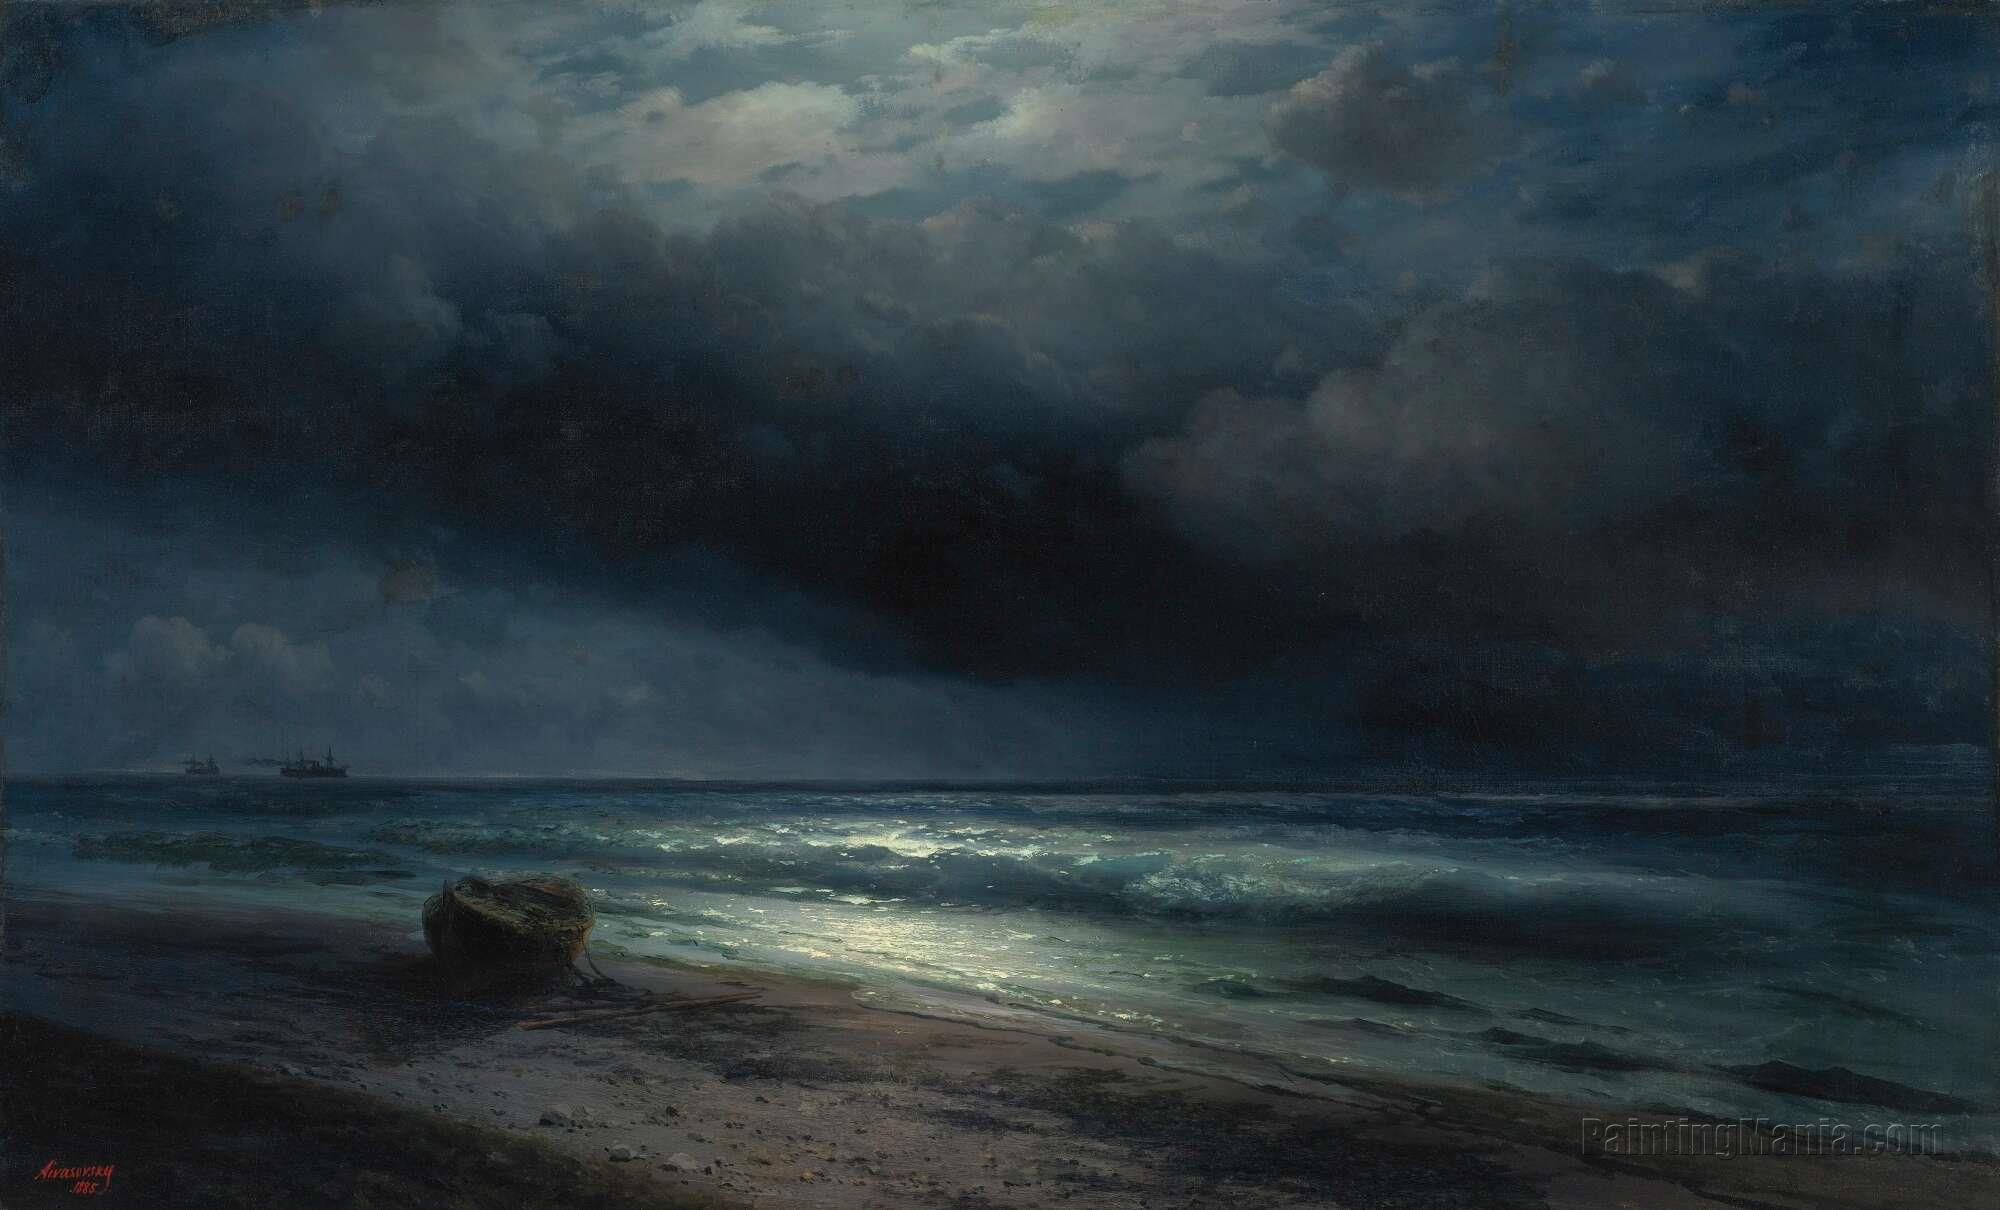 A Moonlit Night at Sea